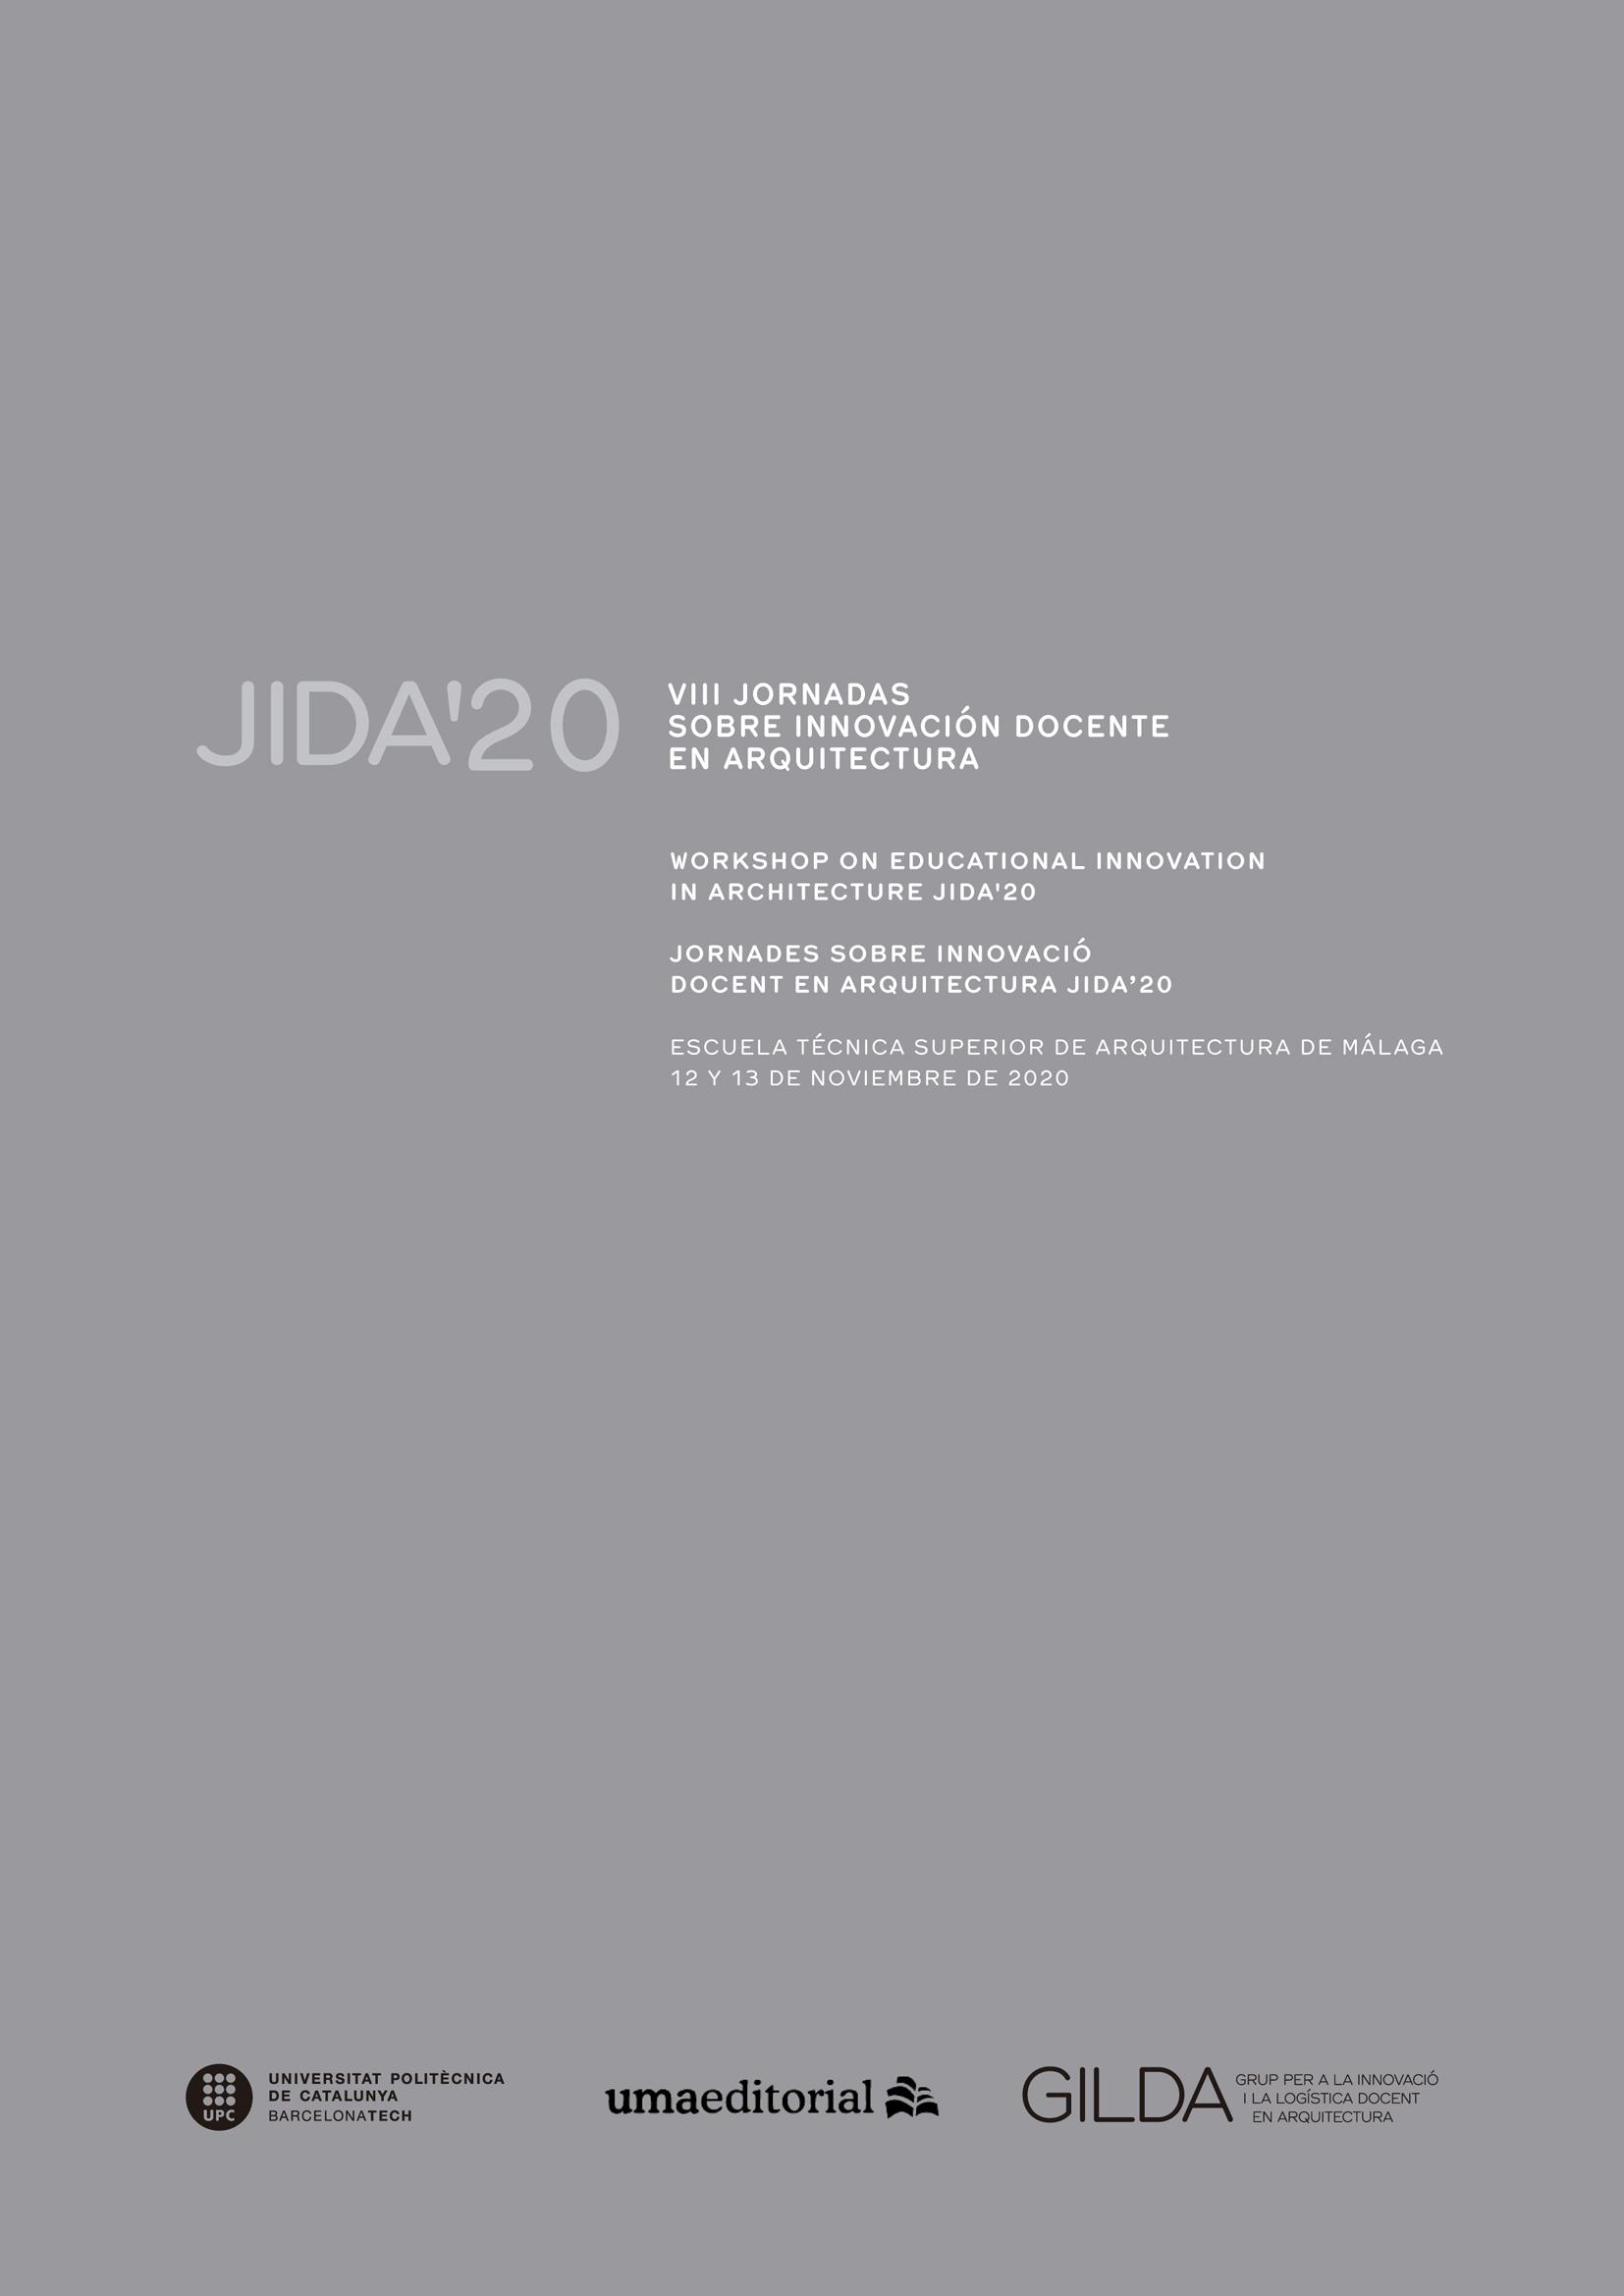 Ver JIDA'20